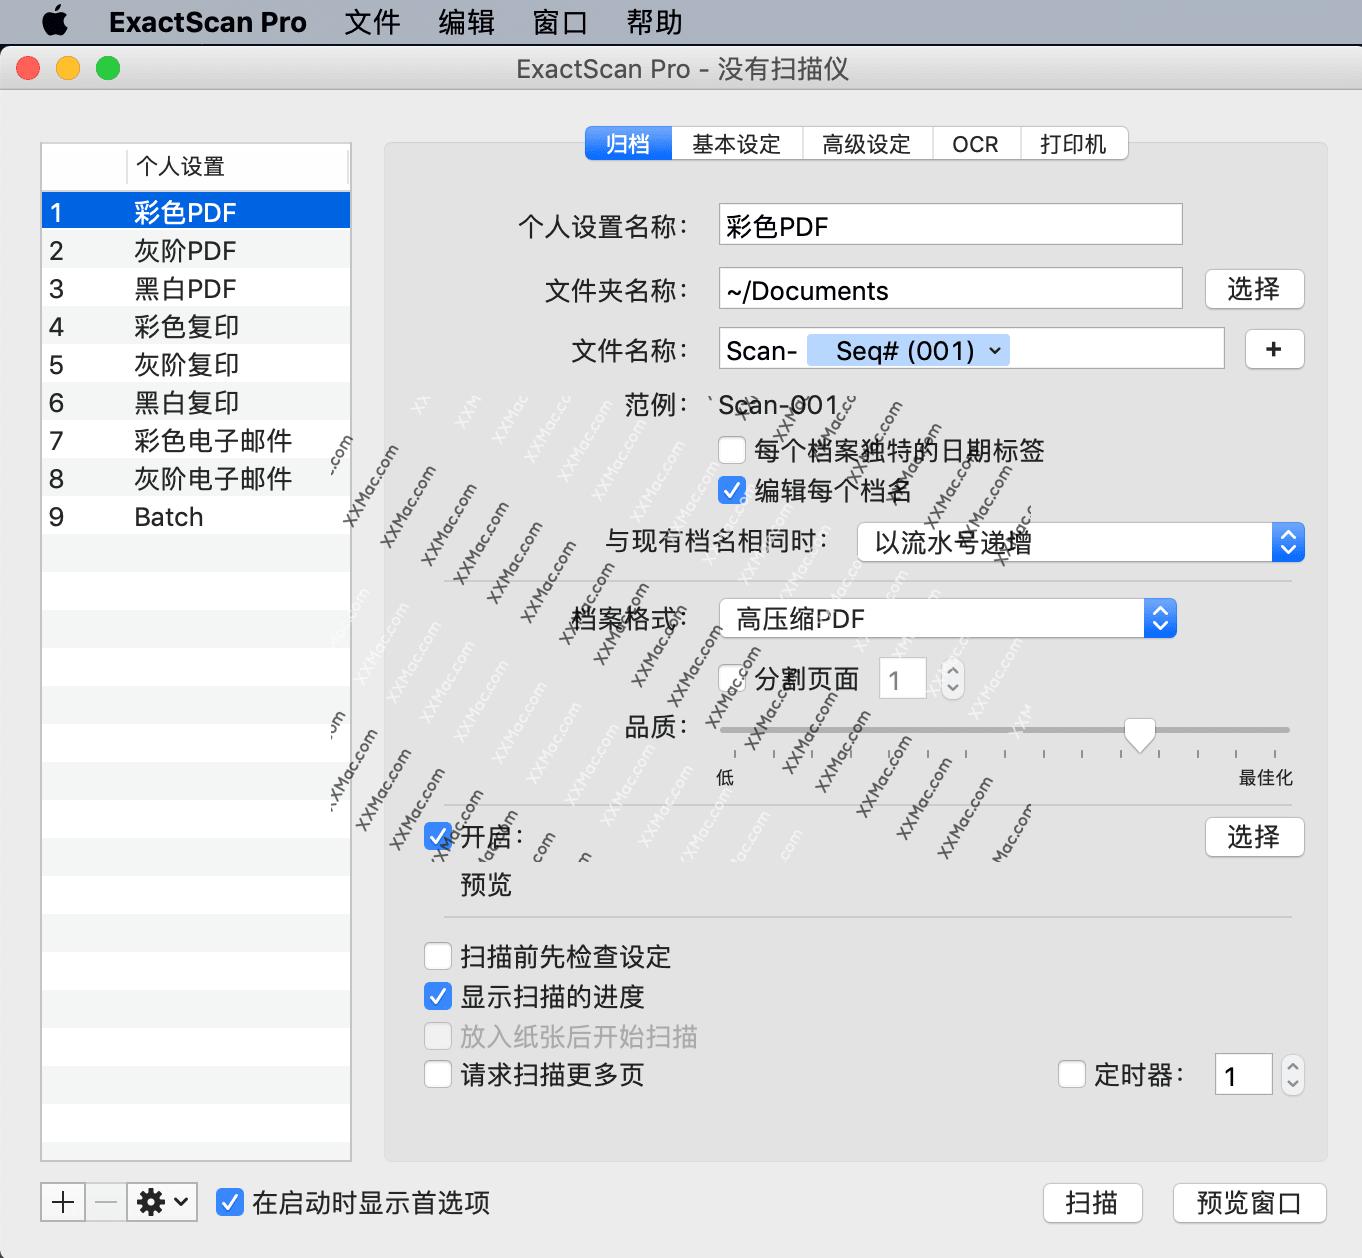 ExactScan Pro for Mac v19.1.13 中文破解版下载 扫描仪整合软件